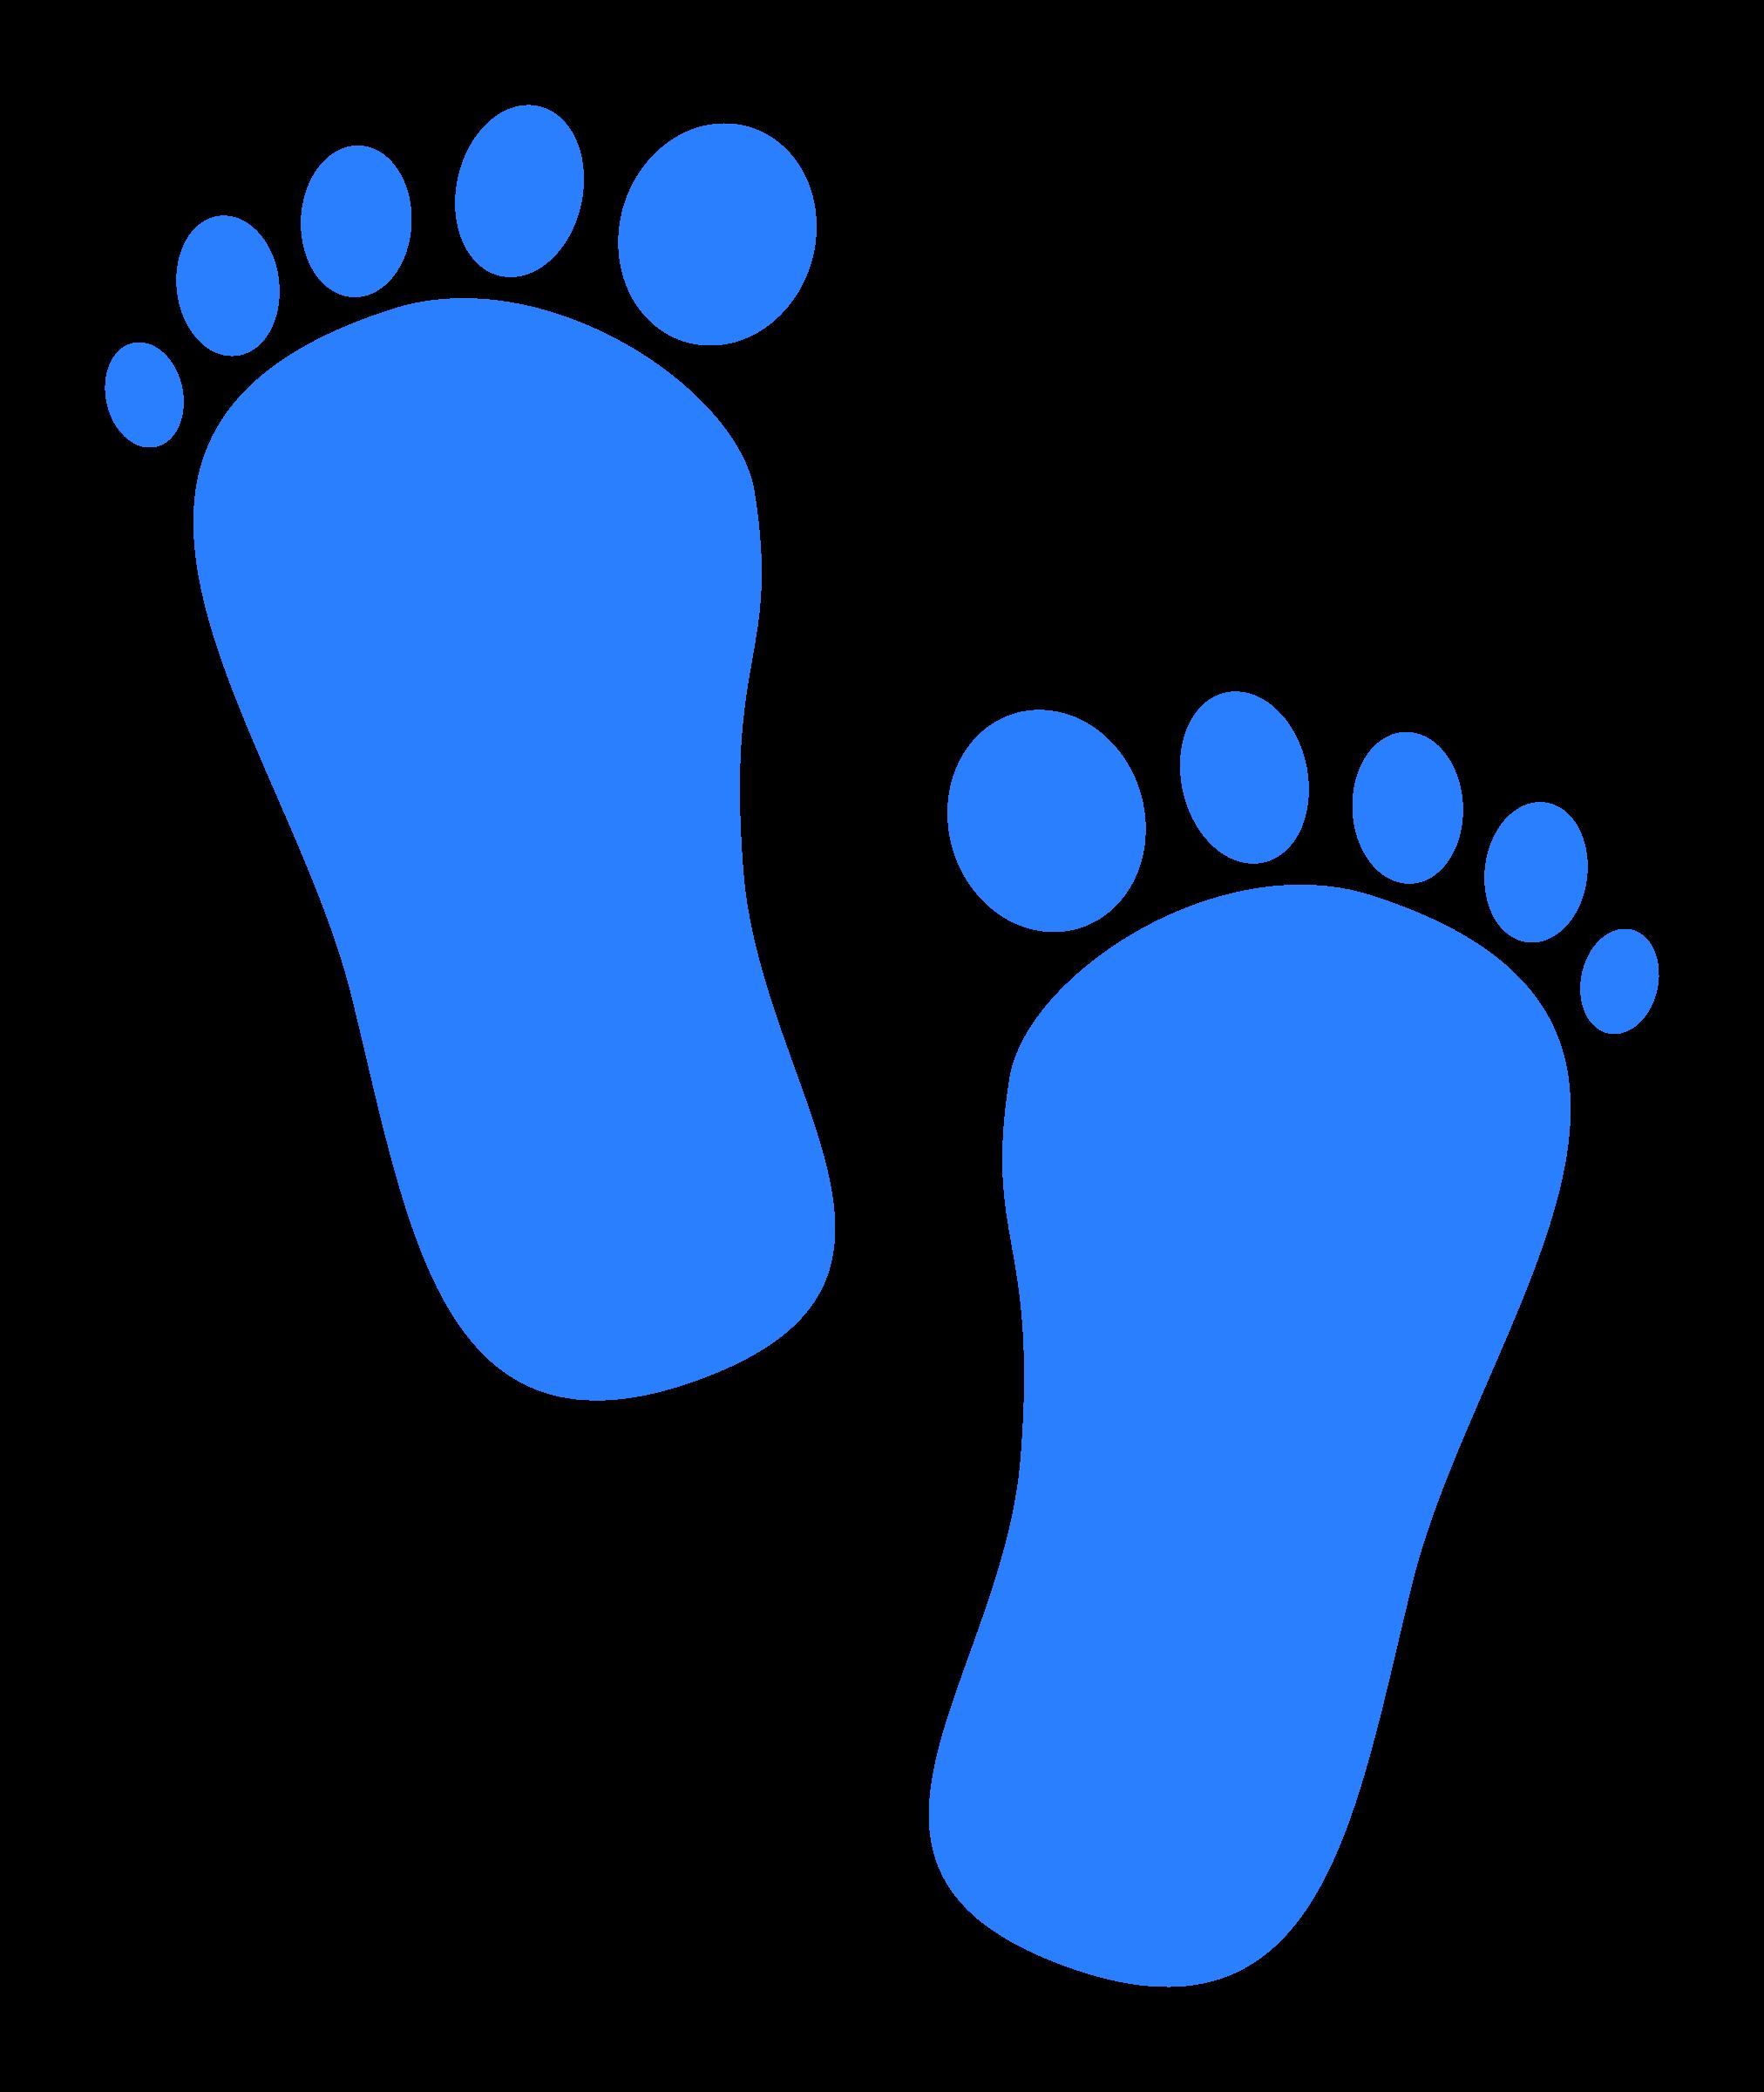 Footsteps clipart far distance. Footprint quiet foot free